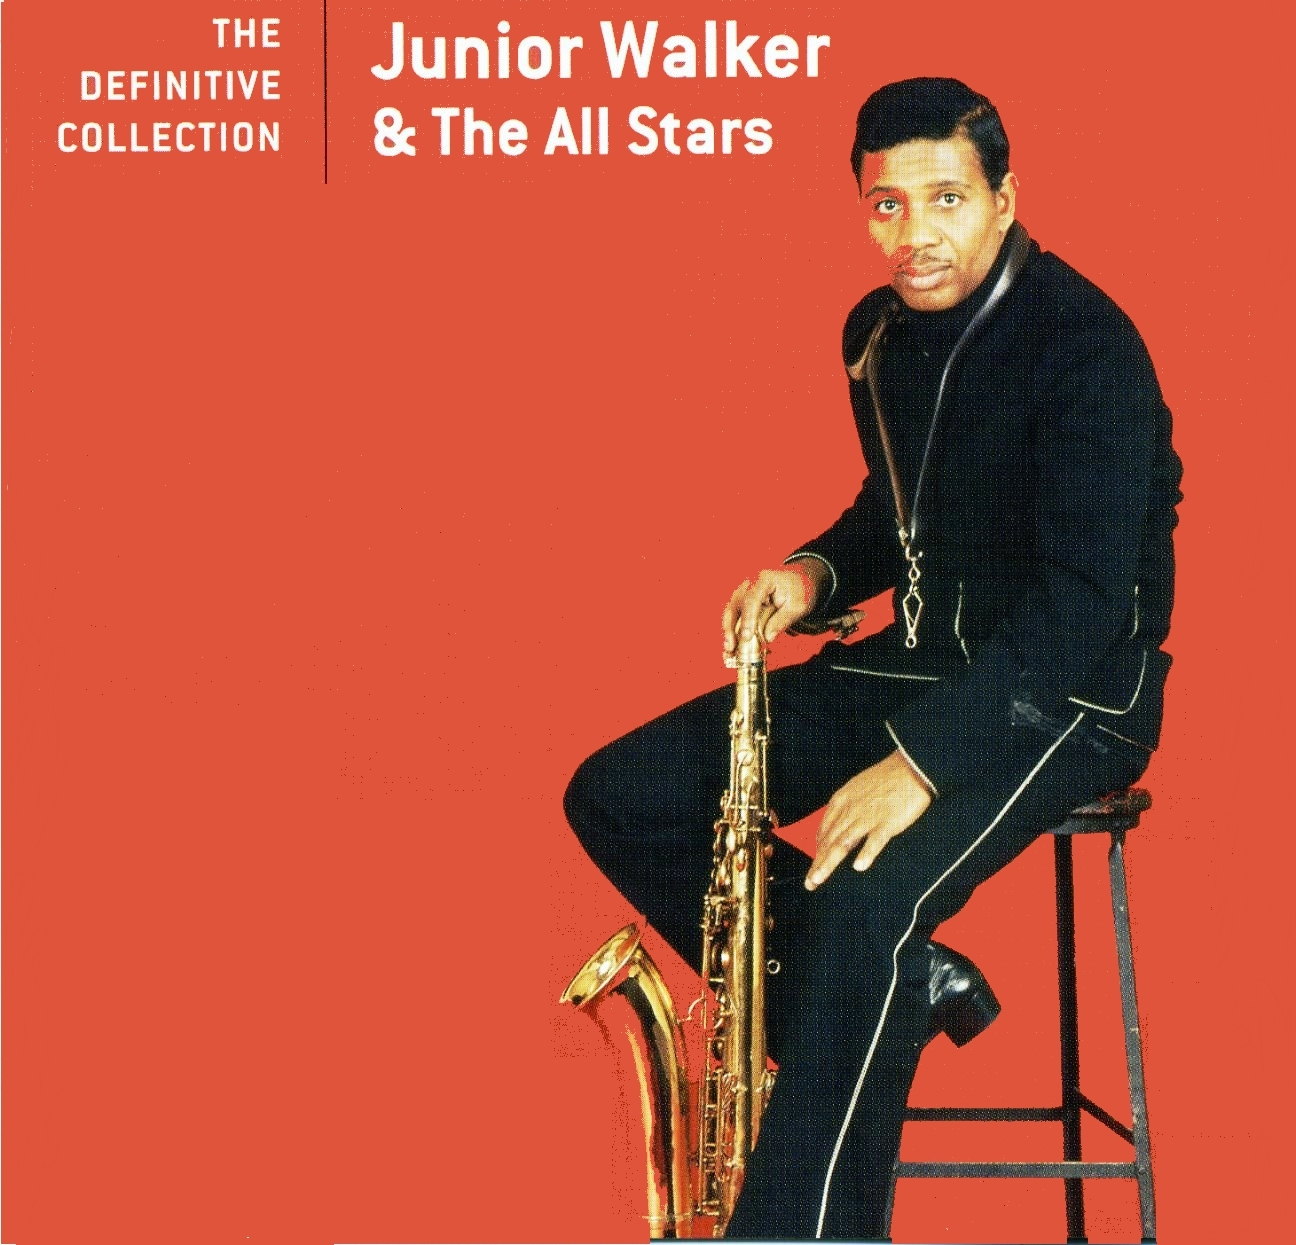 Jr Walker The All Stars Im A Road Runner